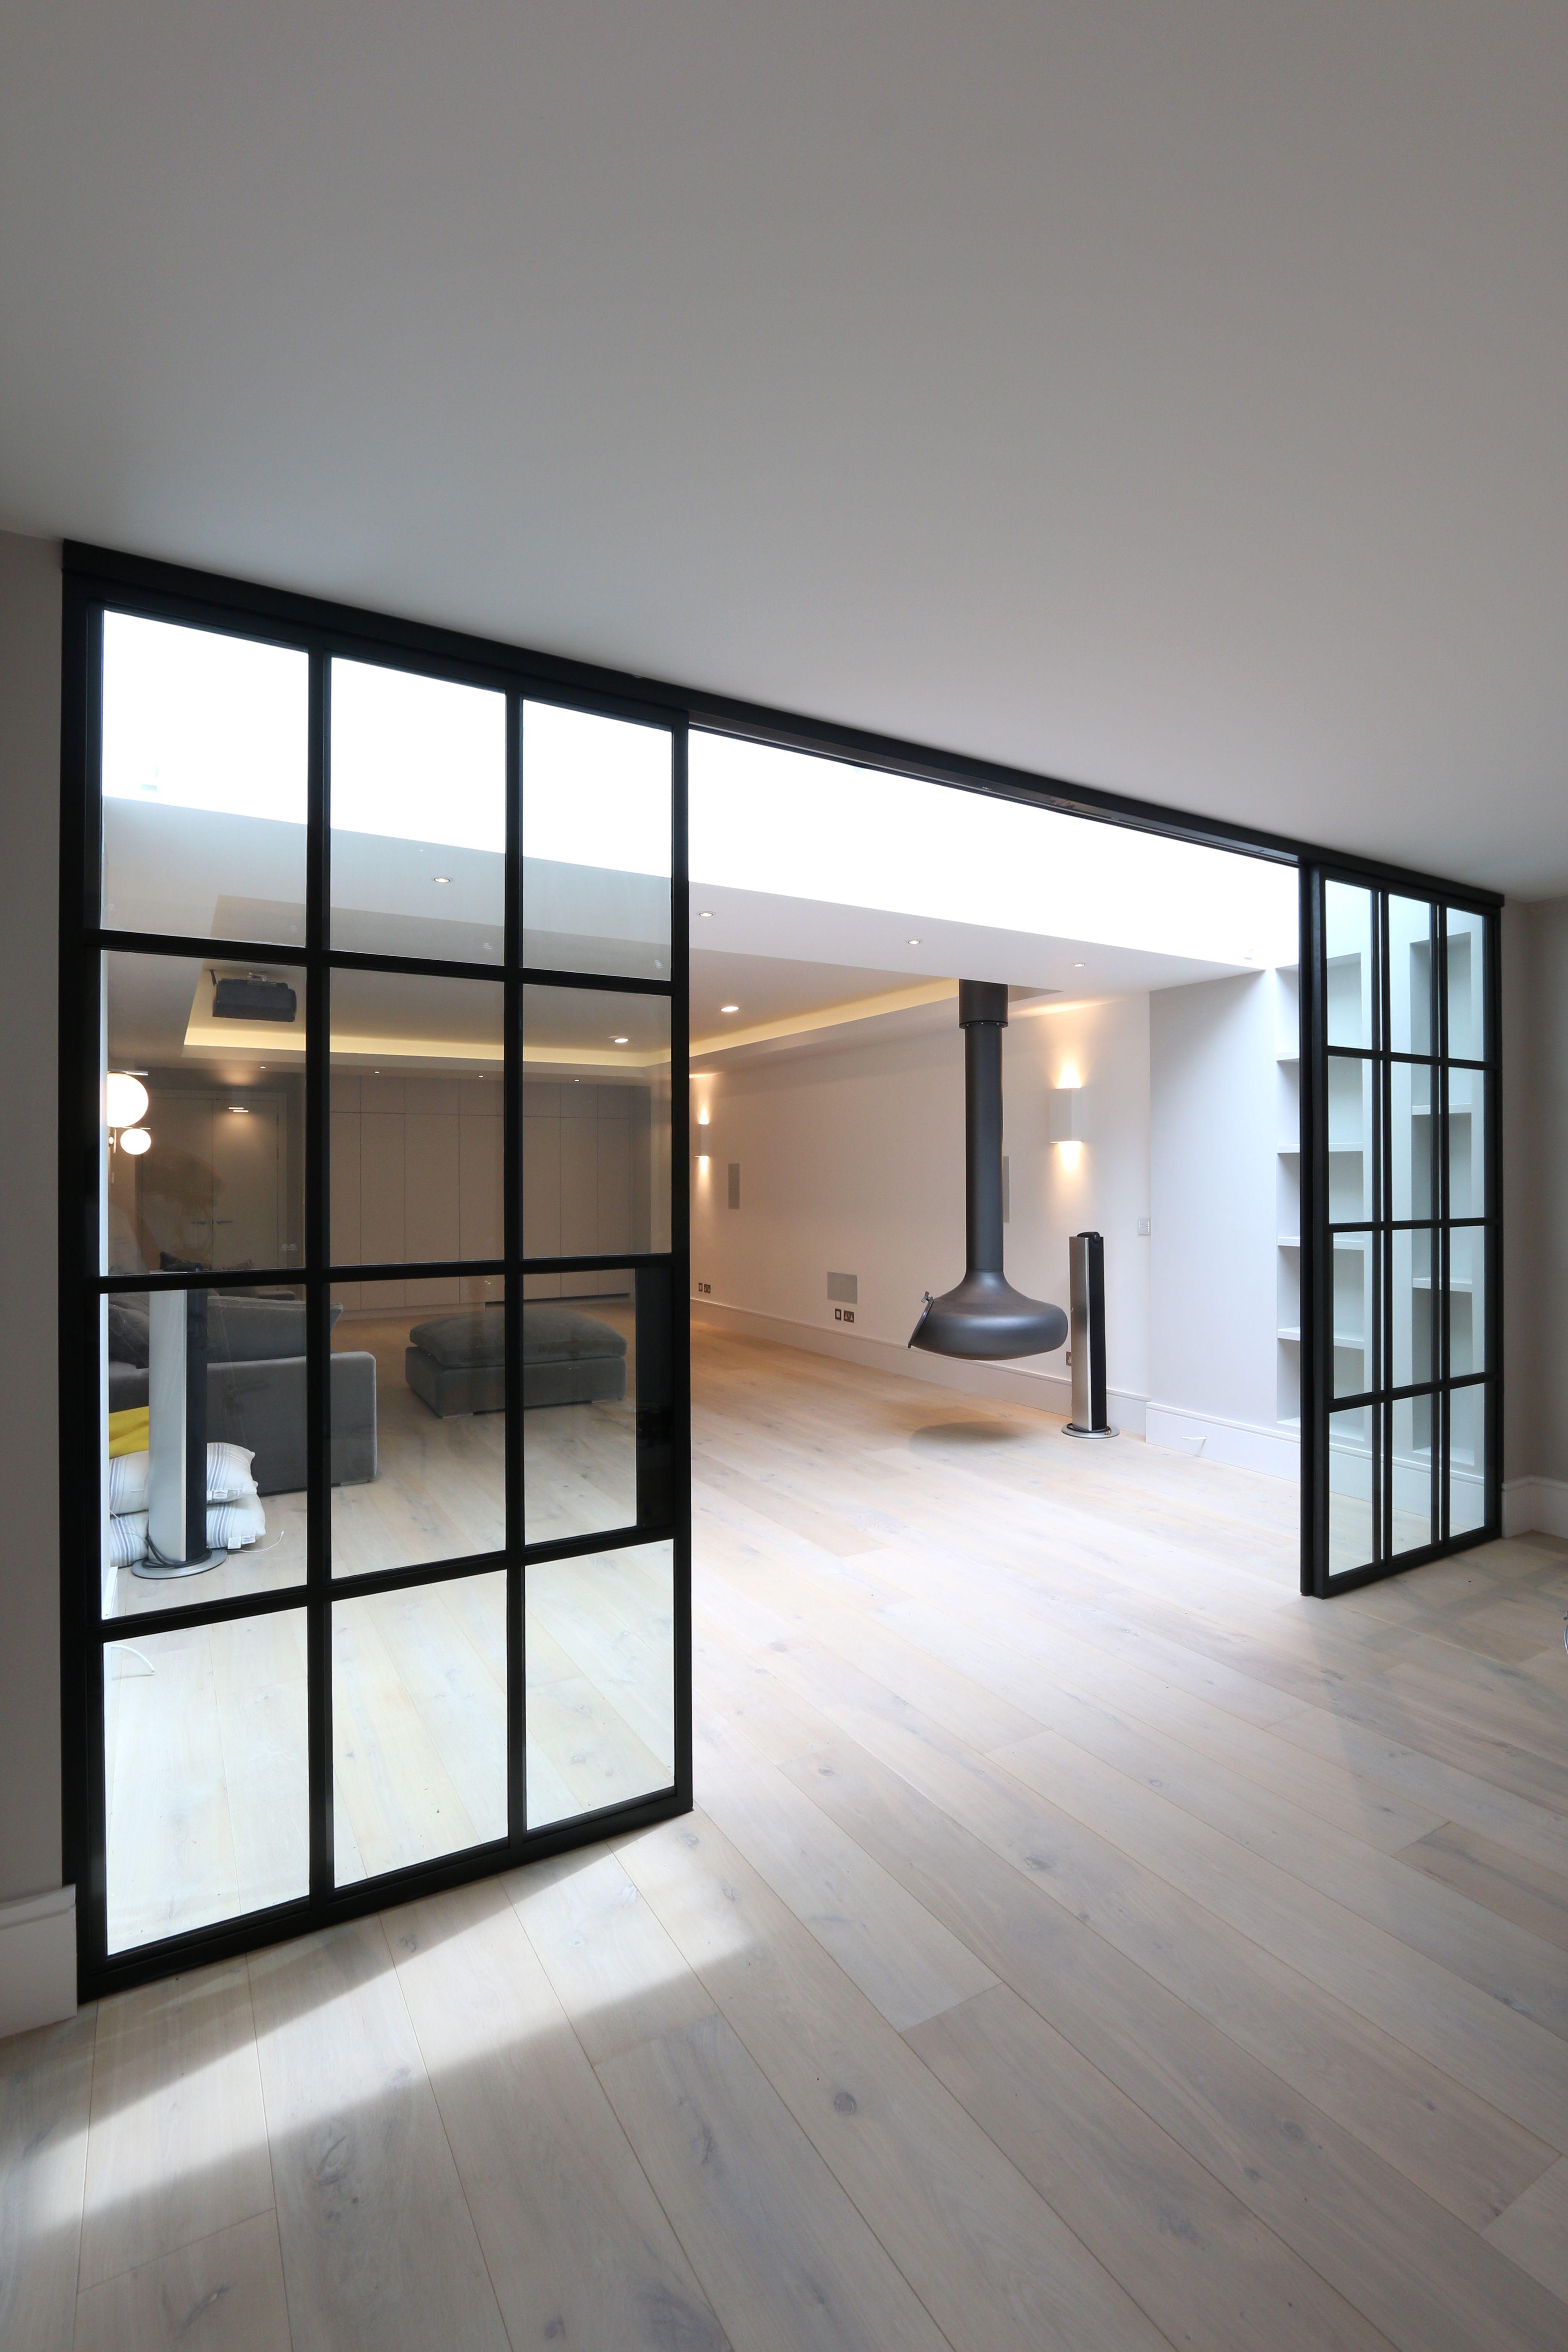 Metal Framed Doors Installed In A Home.